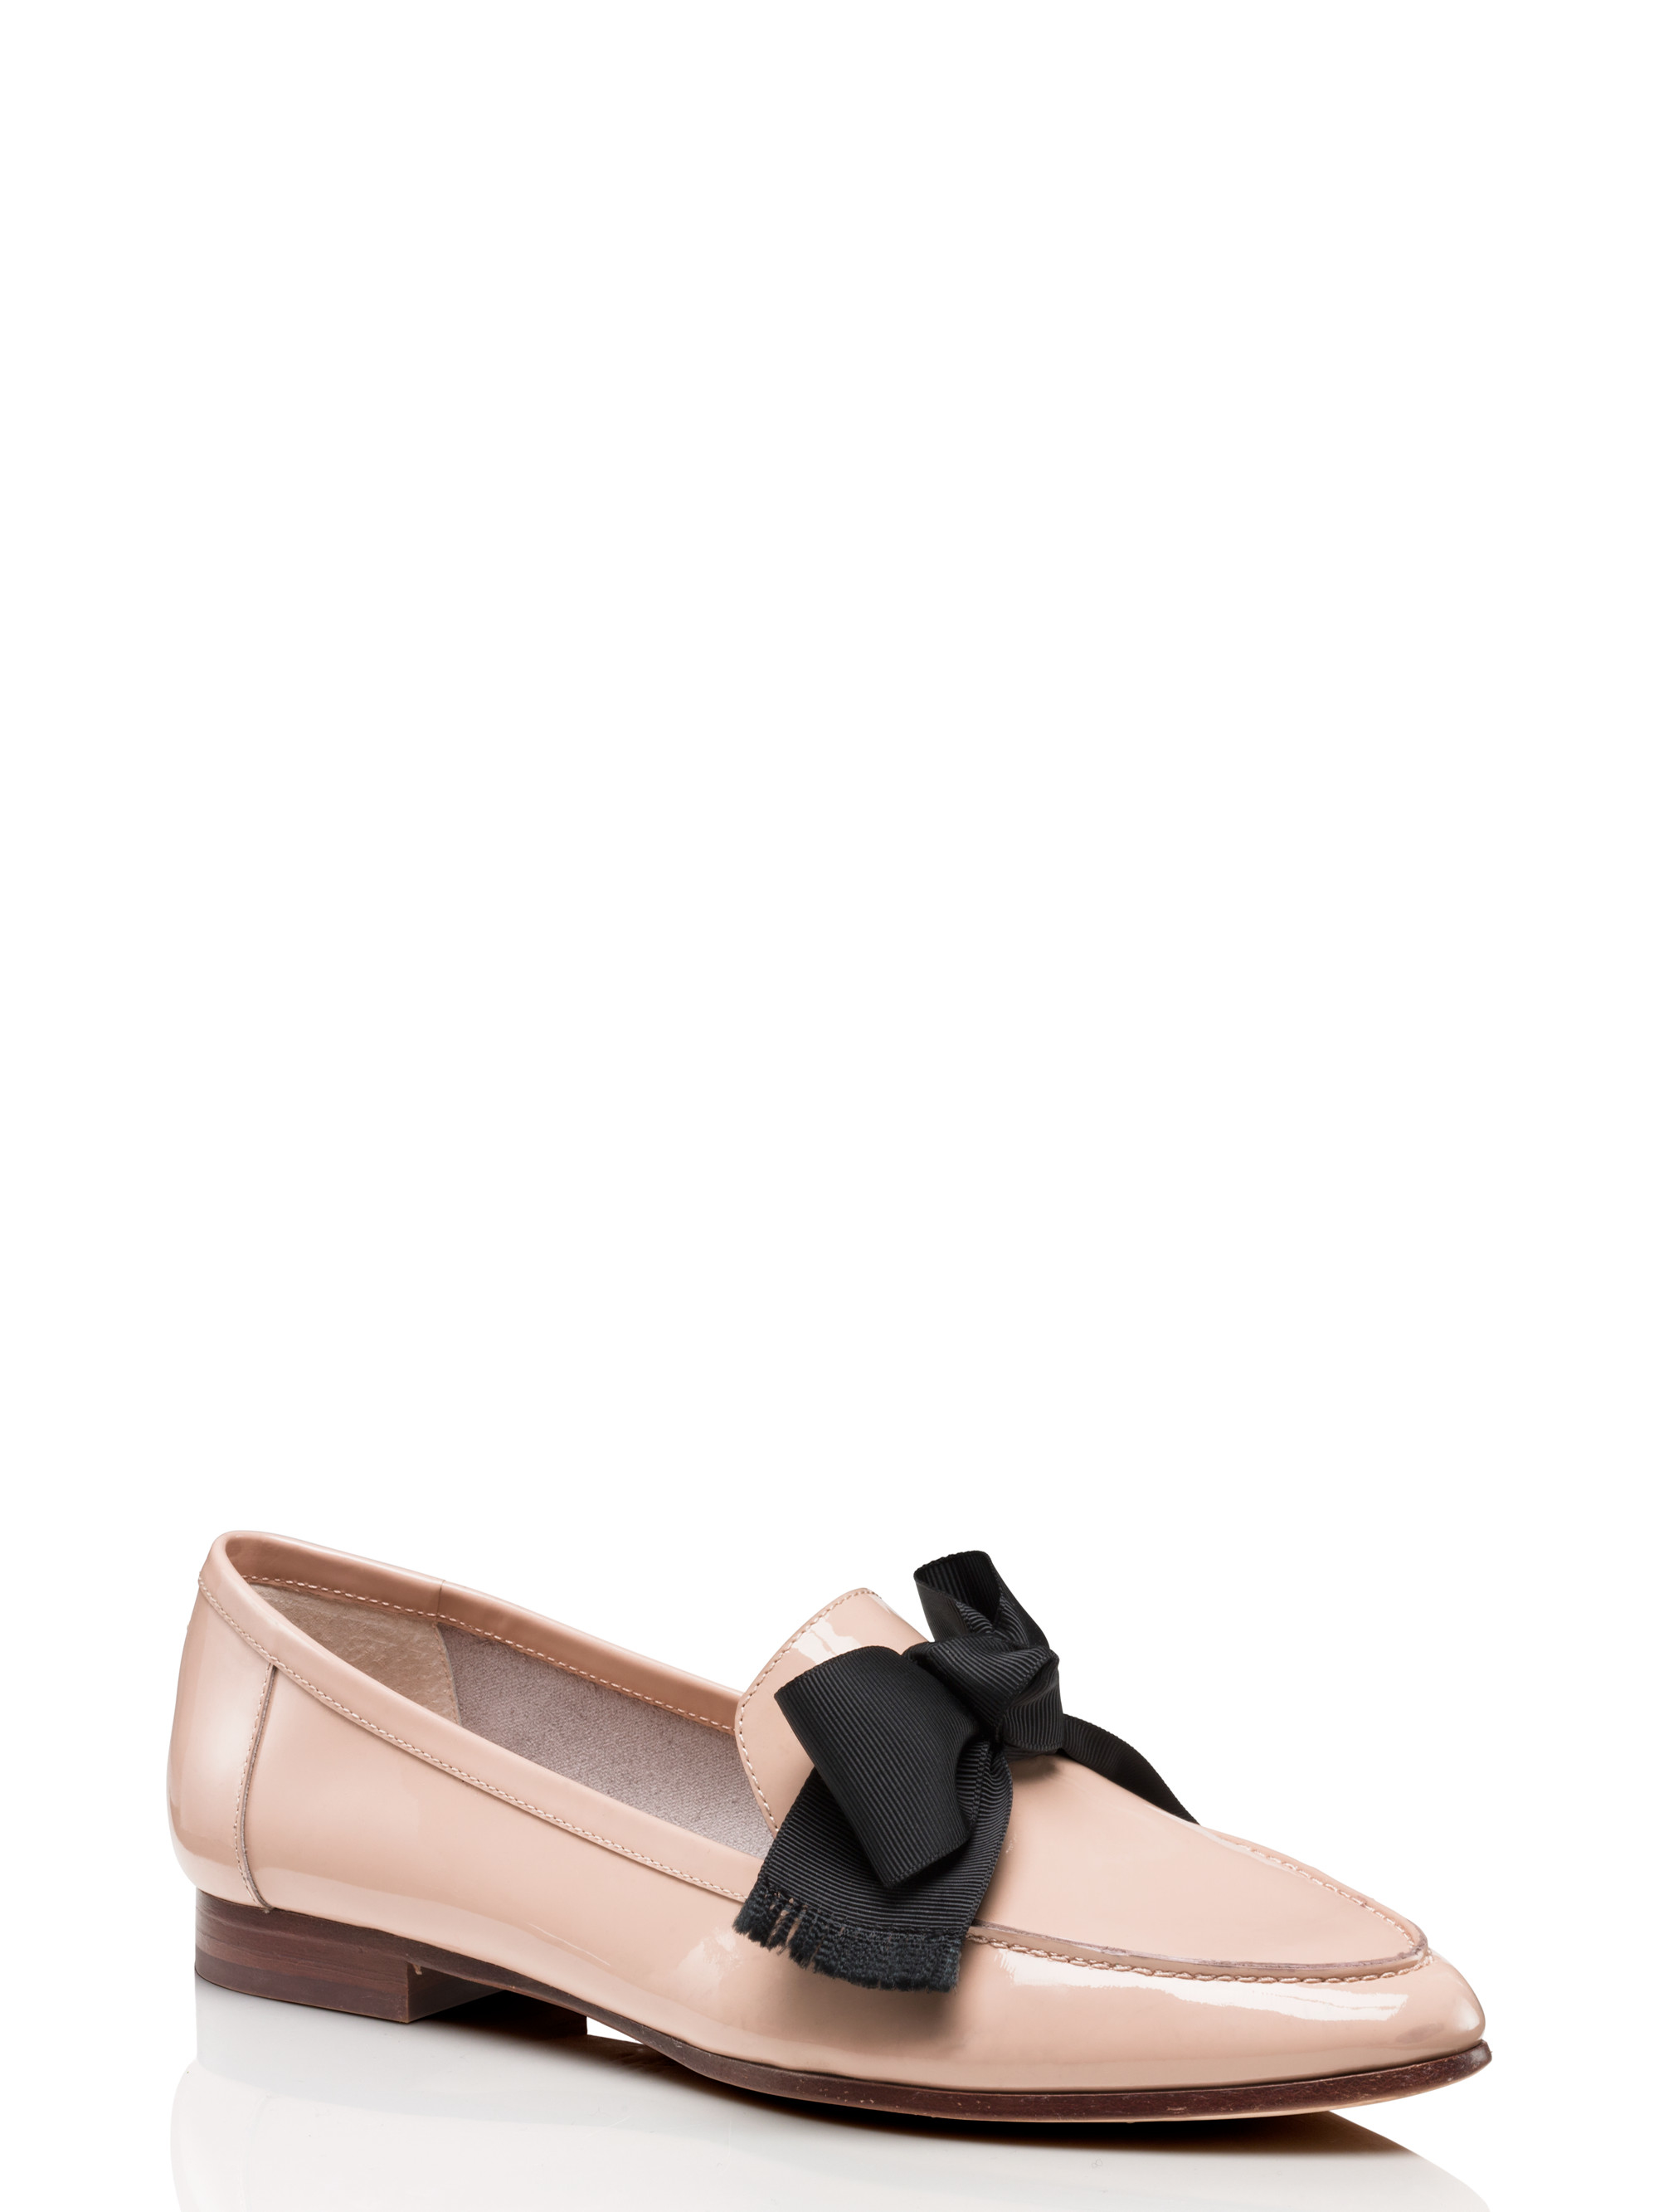 369bd8bd7300 Lyst - Kate Spade Cosetta Too Flats in Pink